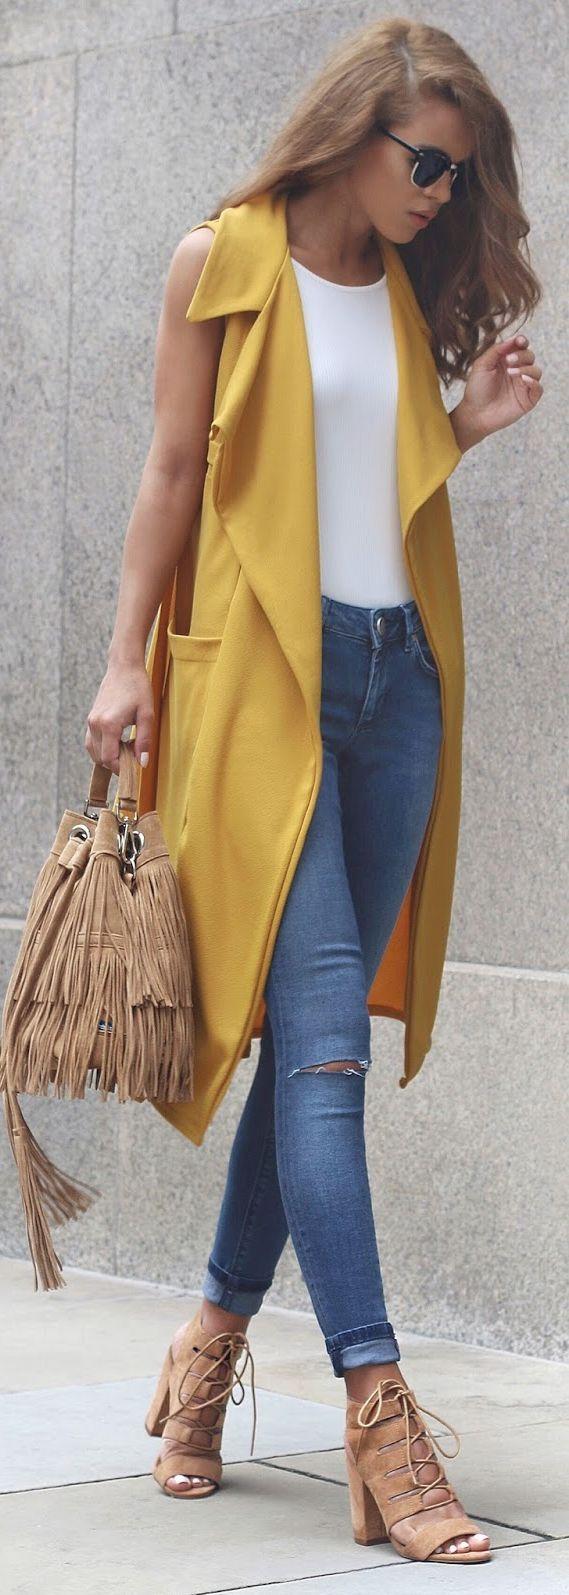 stylish new outfits on the street fw womenus fashion